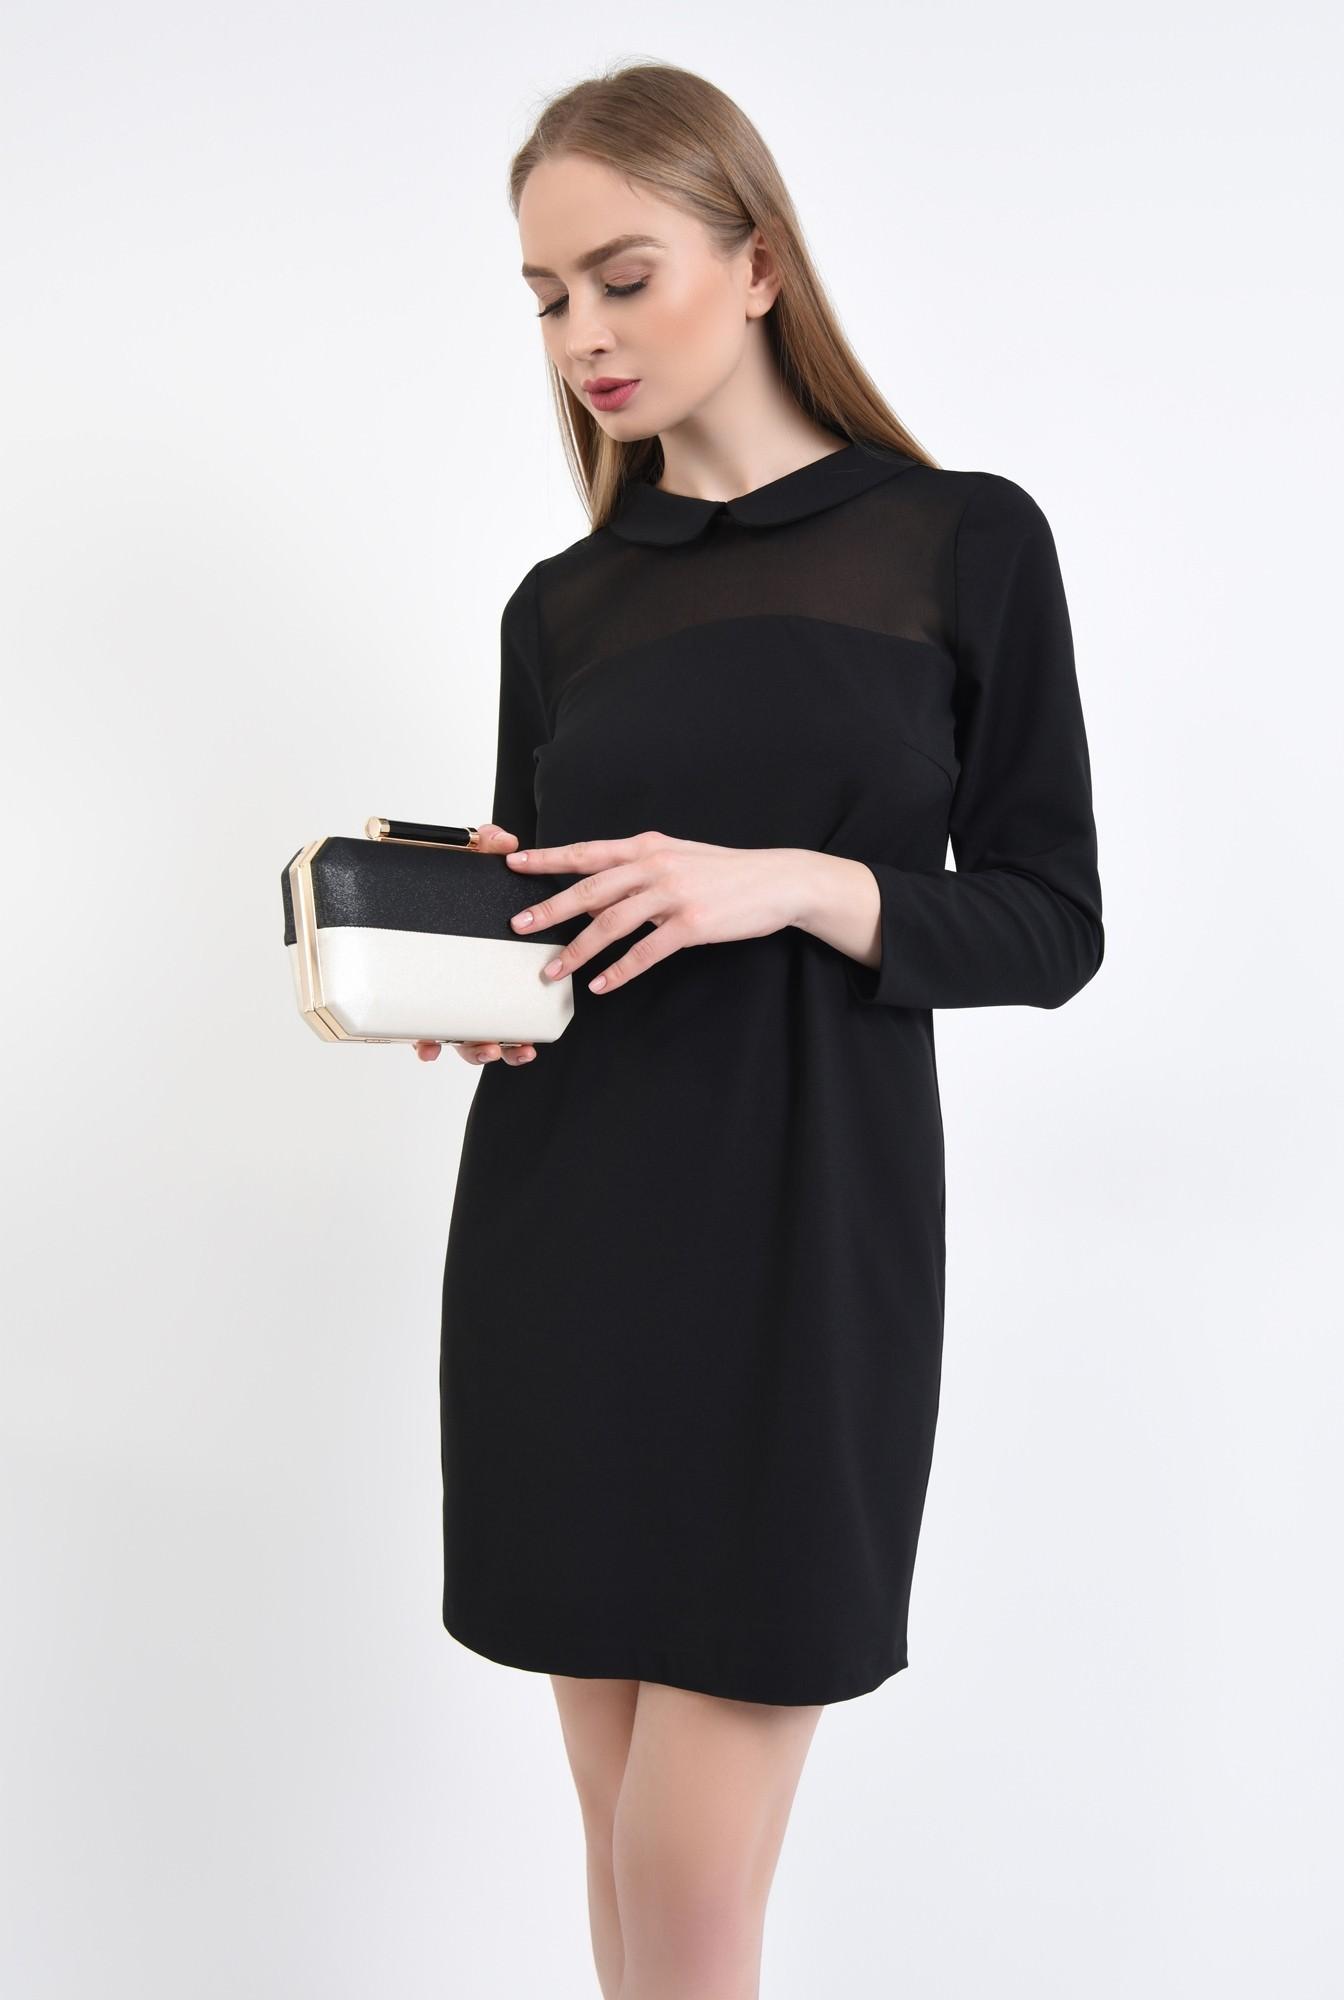 2 - poseta eleganta, clutch, bicolor, plic elegant